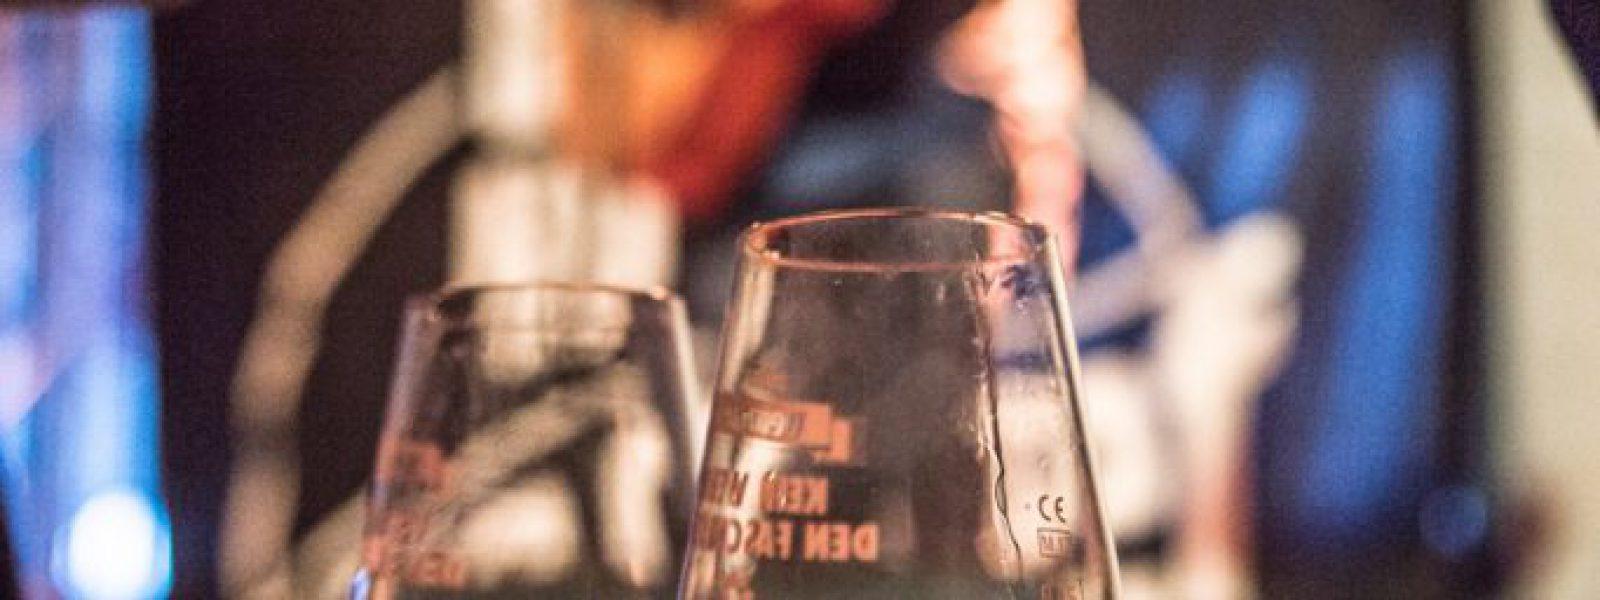 Weinfest gegen Rassismus (Fotos Sabrina Adeline Nagel) - 69